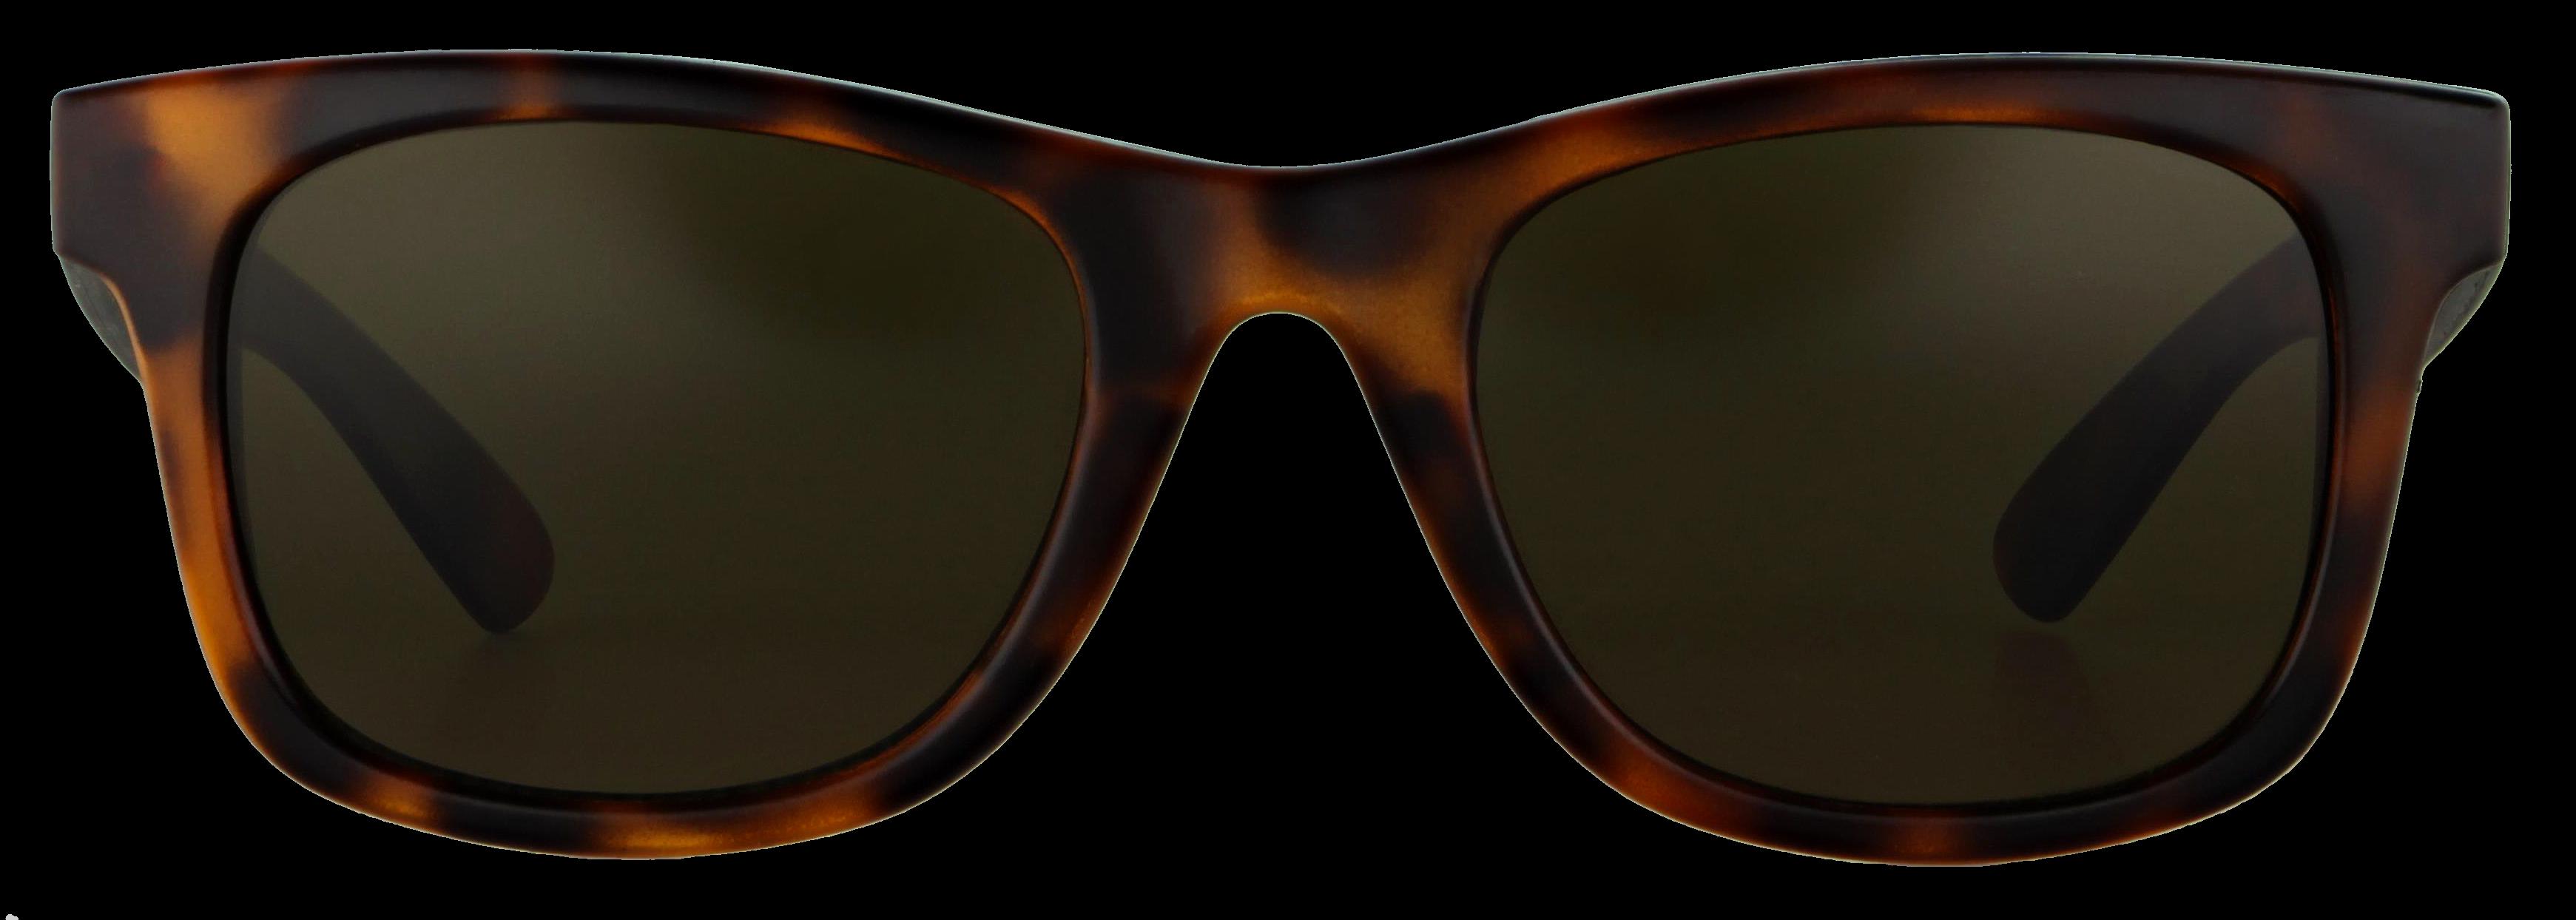 abele optik Kindersonnenbrille 717974